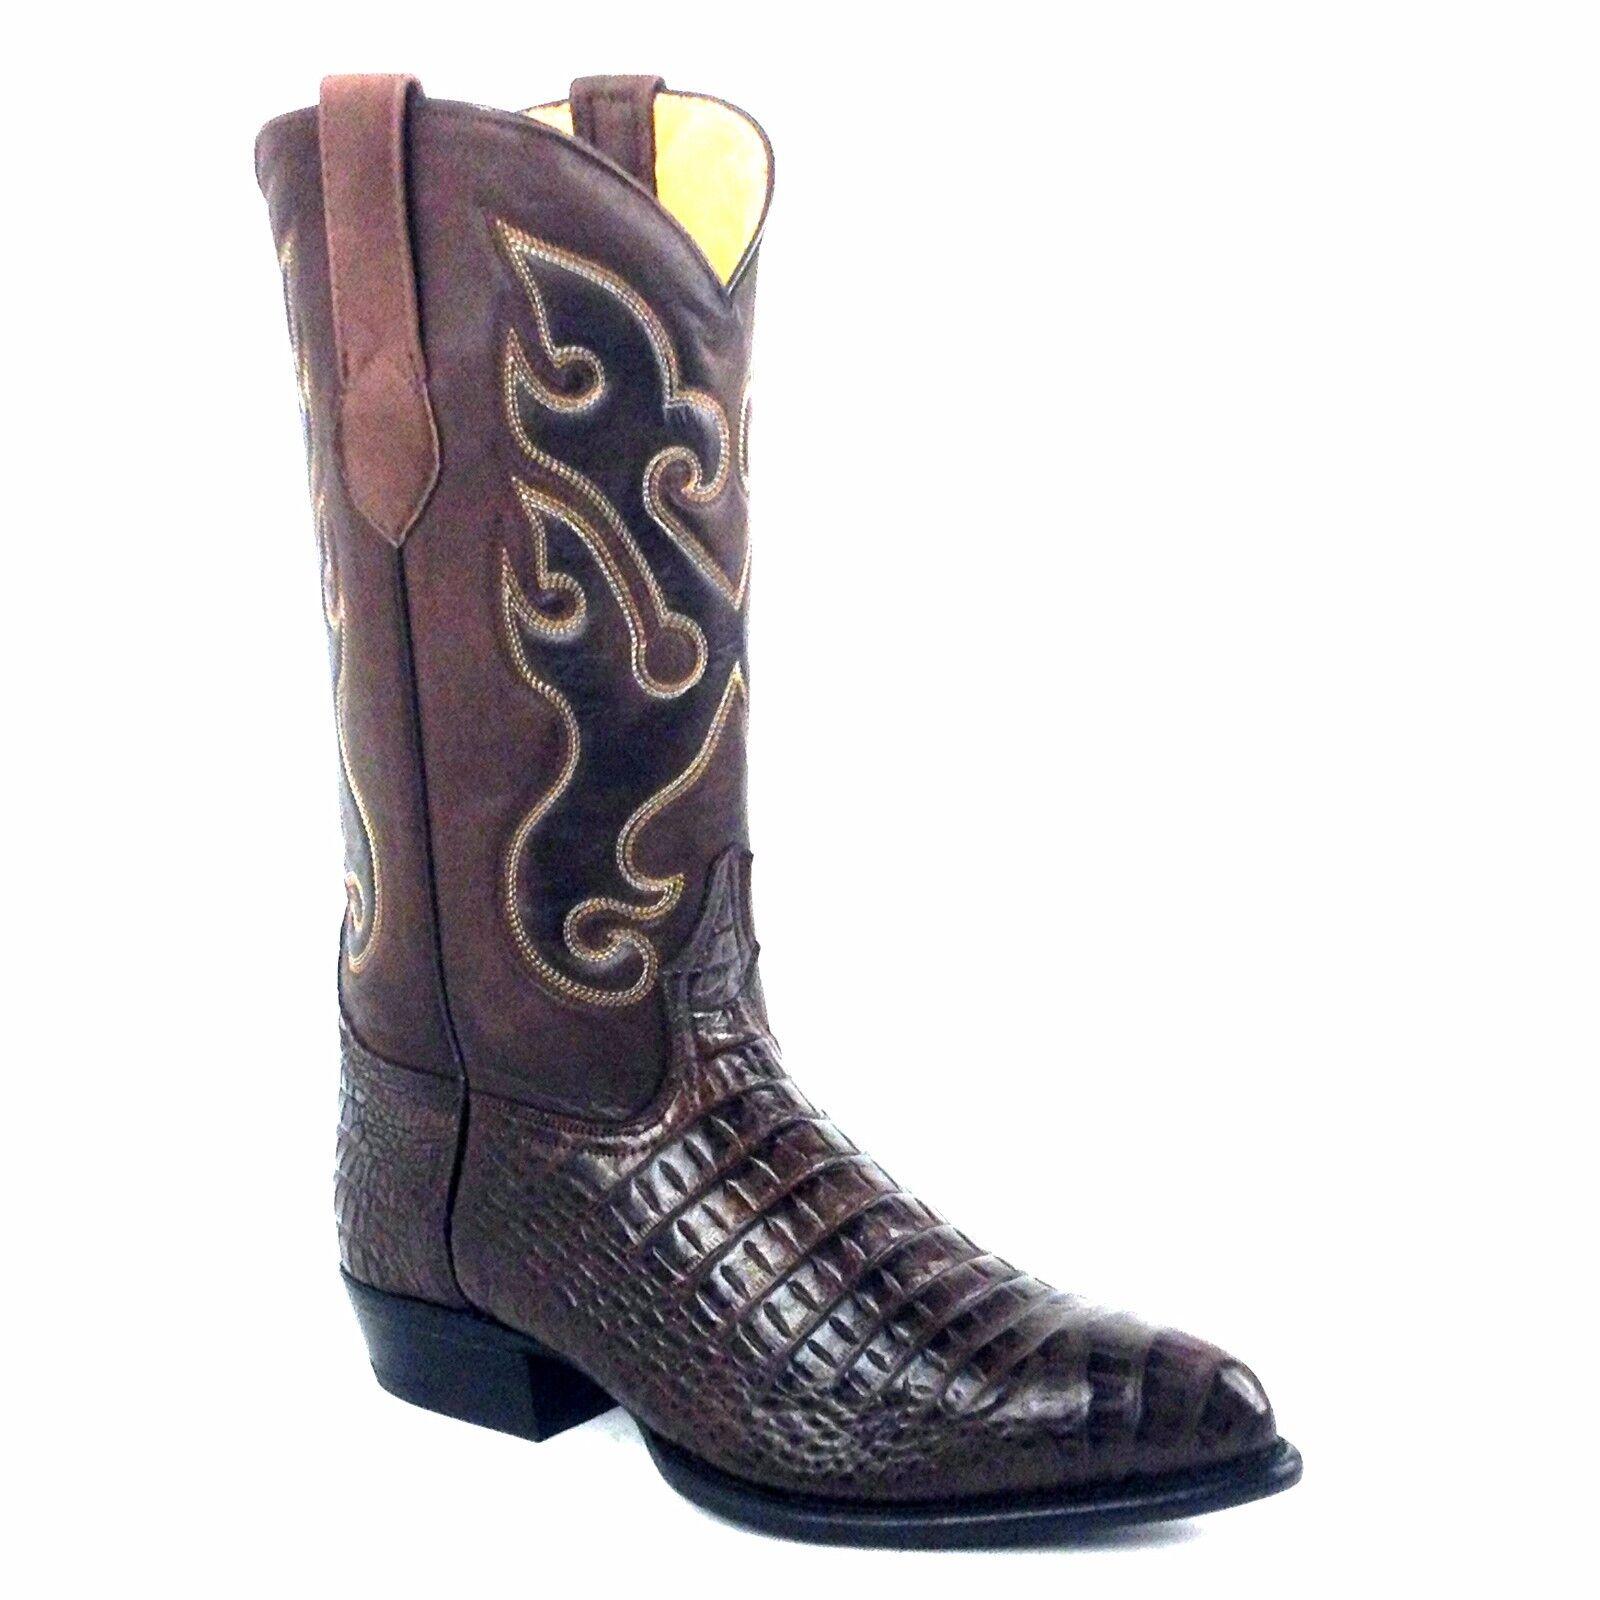 JUSTIN USA BLACK CALFSKIN LEATHER WESTERN BOOTS 3040 Tobias Men's 12 Vibram sole